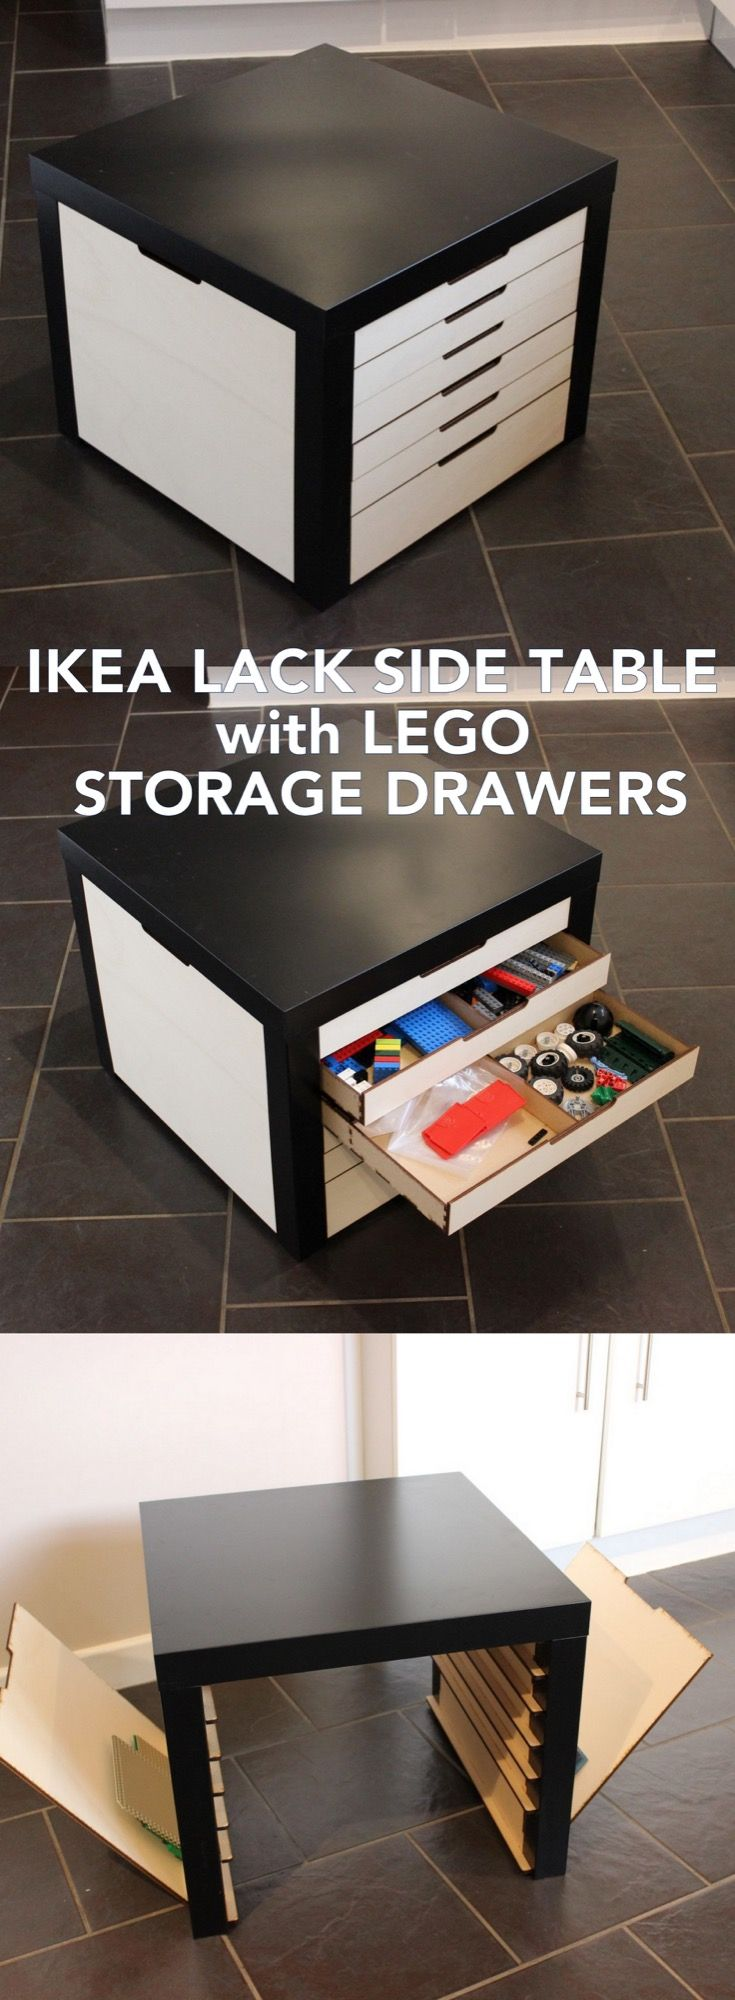 Lego Storage Drawers Beautifully Built Into Lack Table Ikea Hackers Lego Storage Drawers Lego Storage Storage Hacks Bedroom [ 2000 x 735 Pixel ]